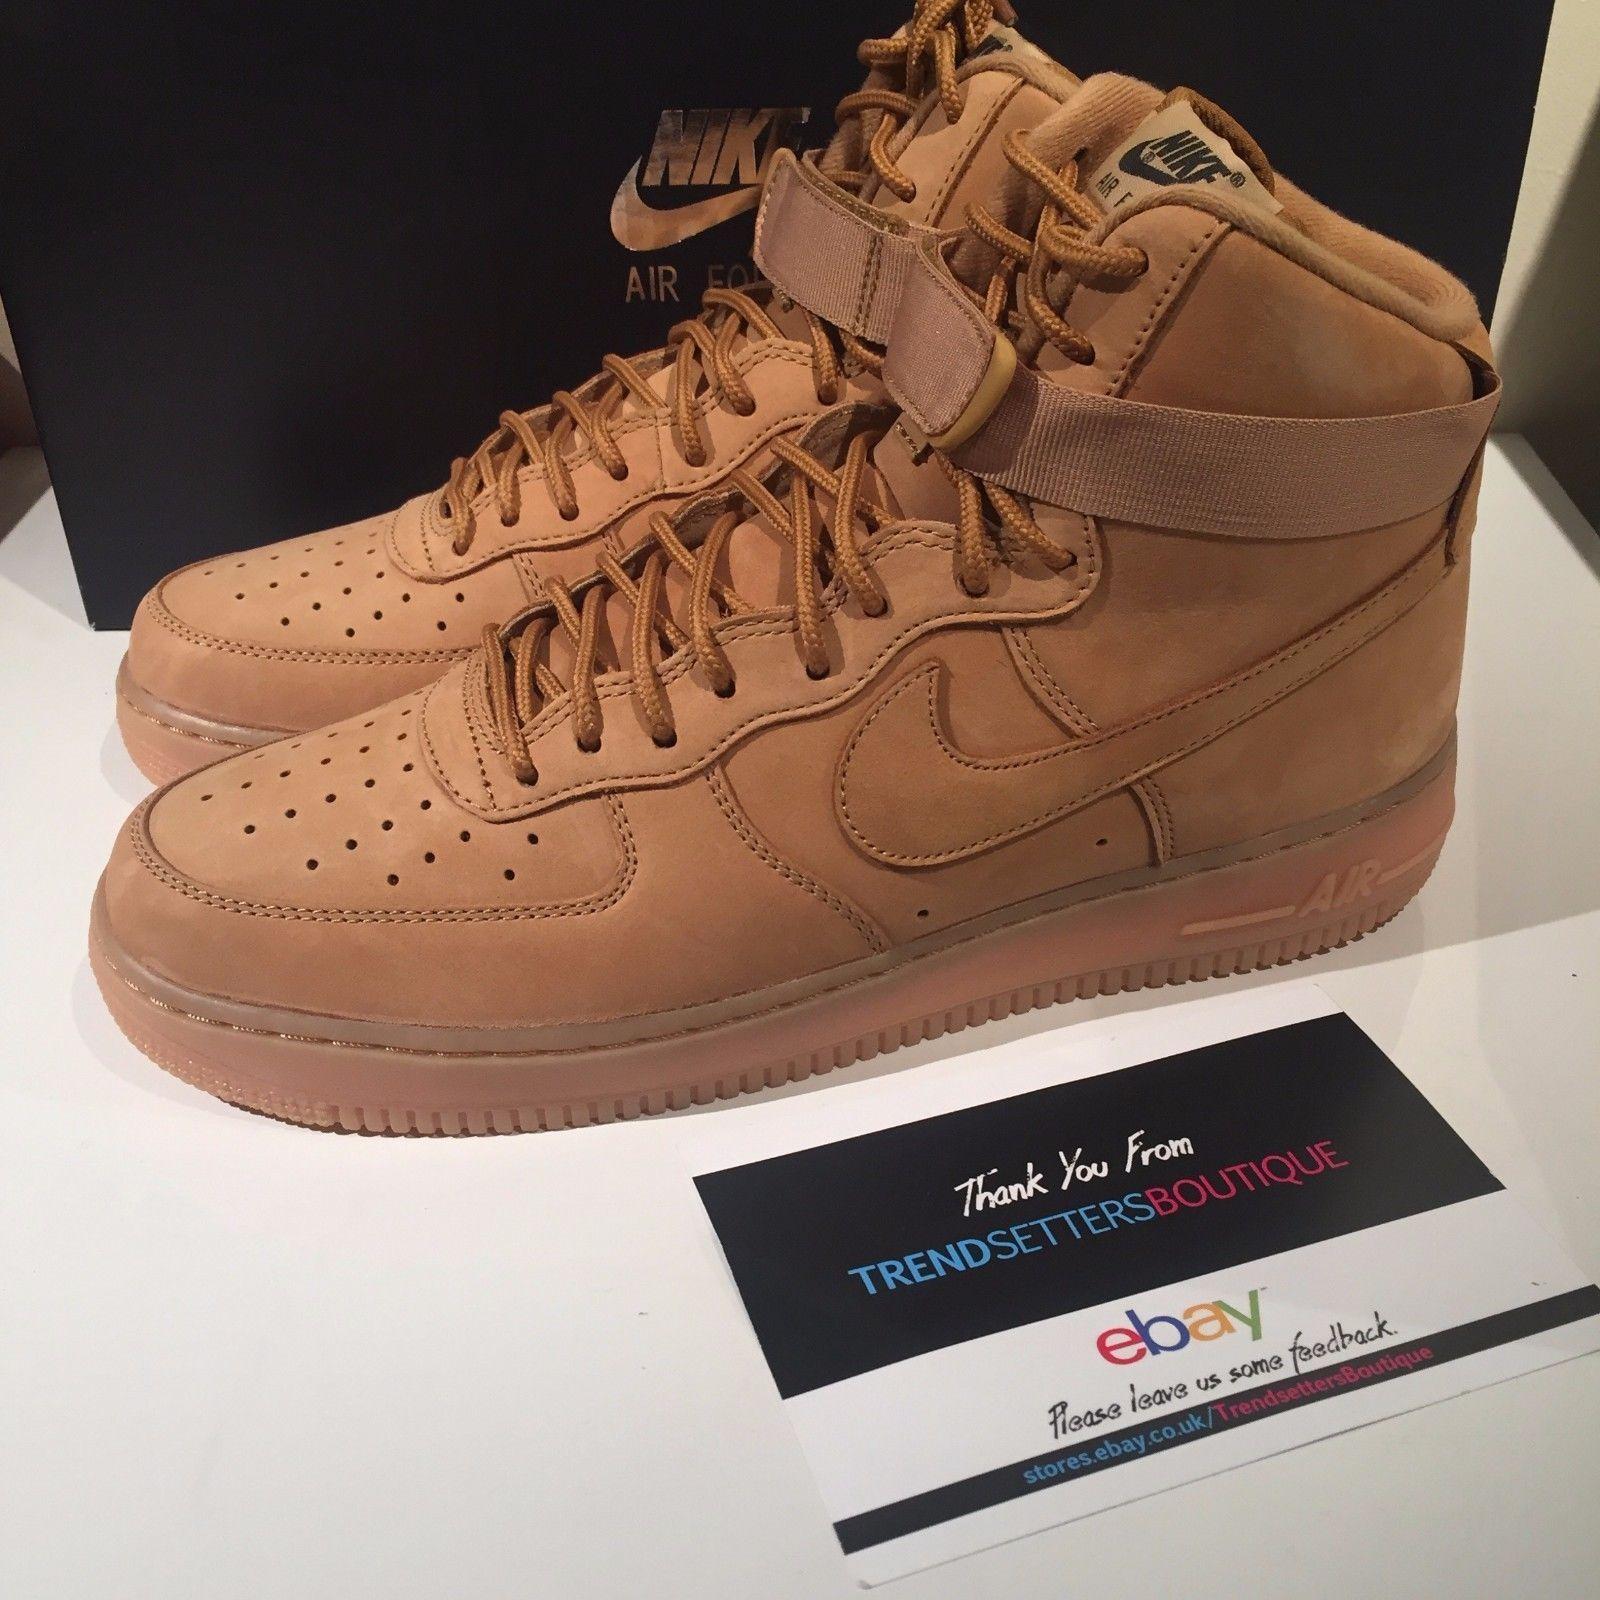 super tanie przybywa uroczy Nike air force 1 one uk us 5 6 7 8 9 10 11 12 high wheat ...